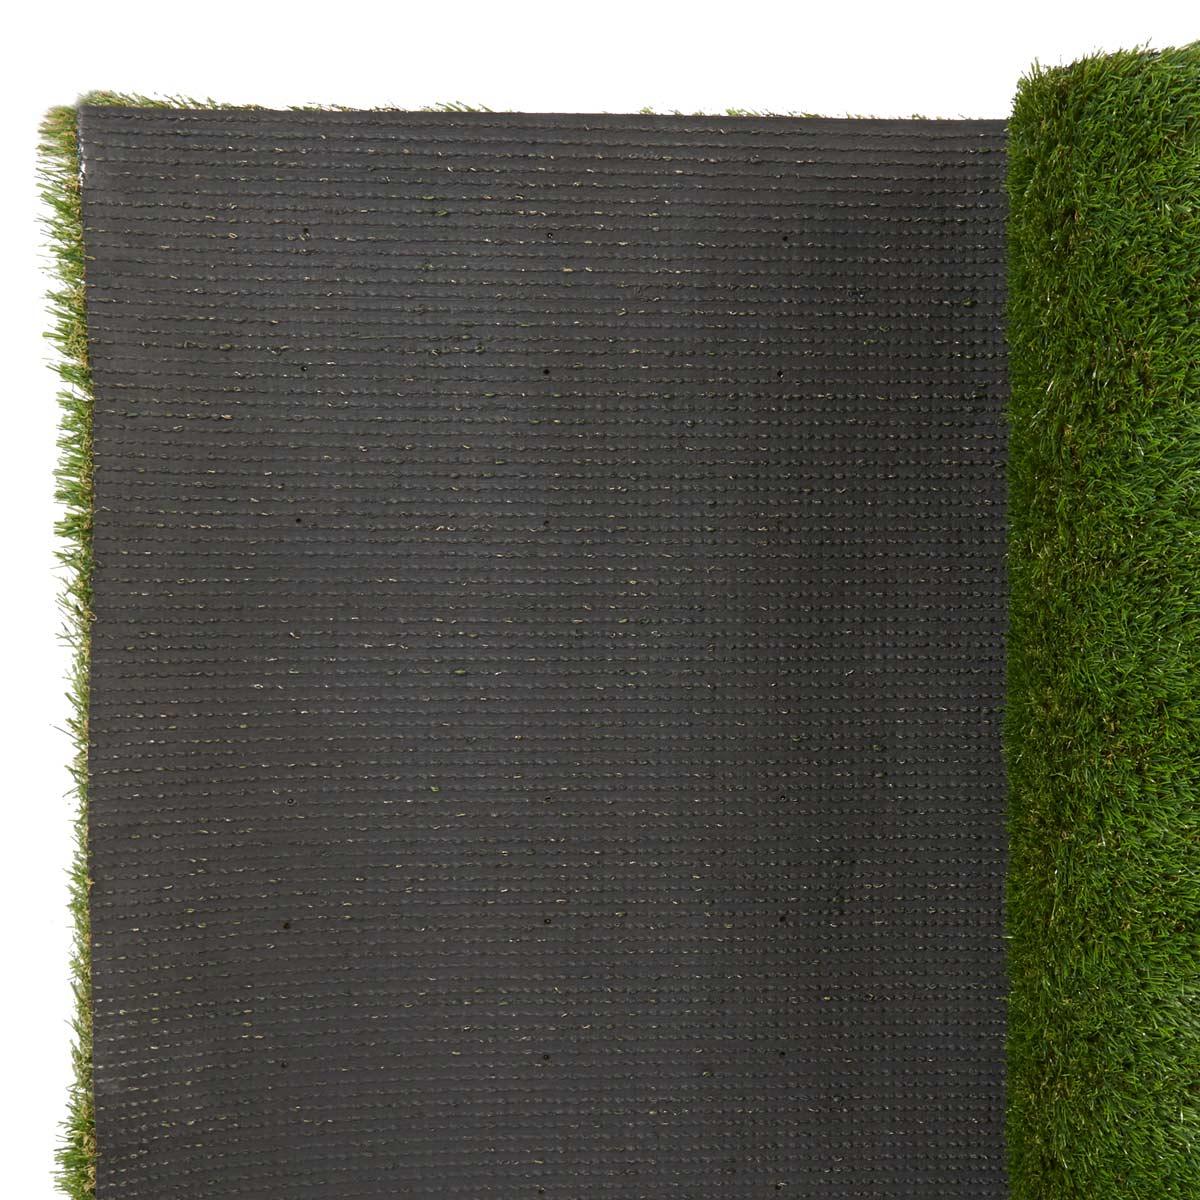 herbe pas cher elegant herbe pas cher avec gazon synth tique v nementiel des id es cr atives. Black Bedroom Furniture Sets. Home Design Ideas